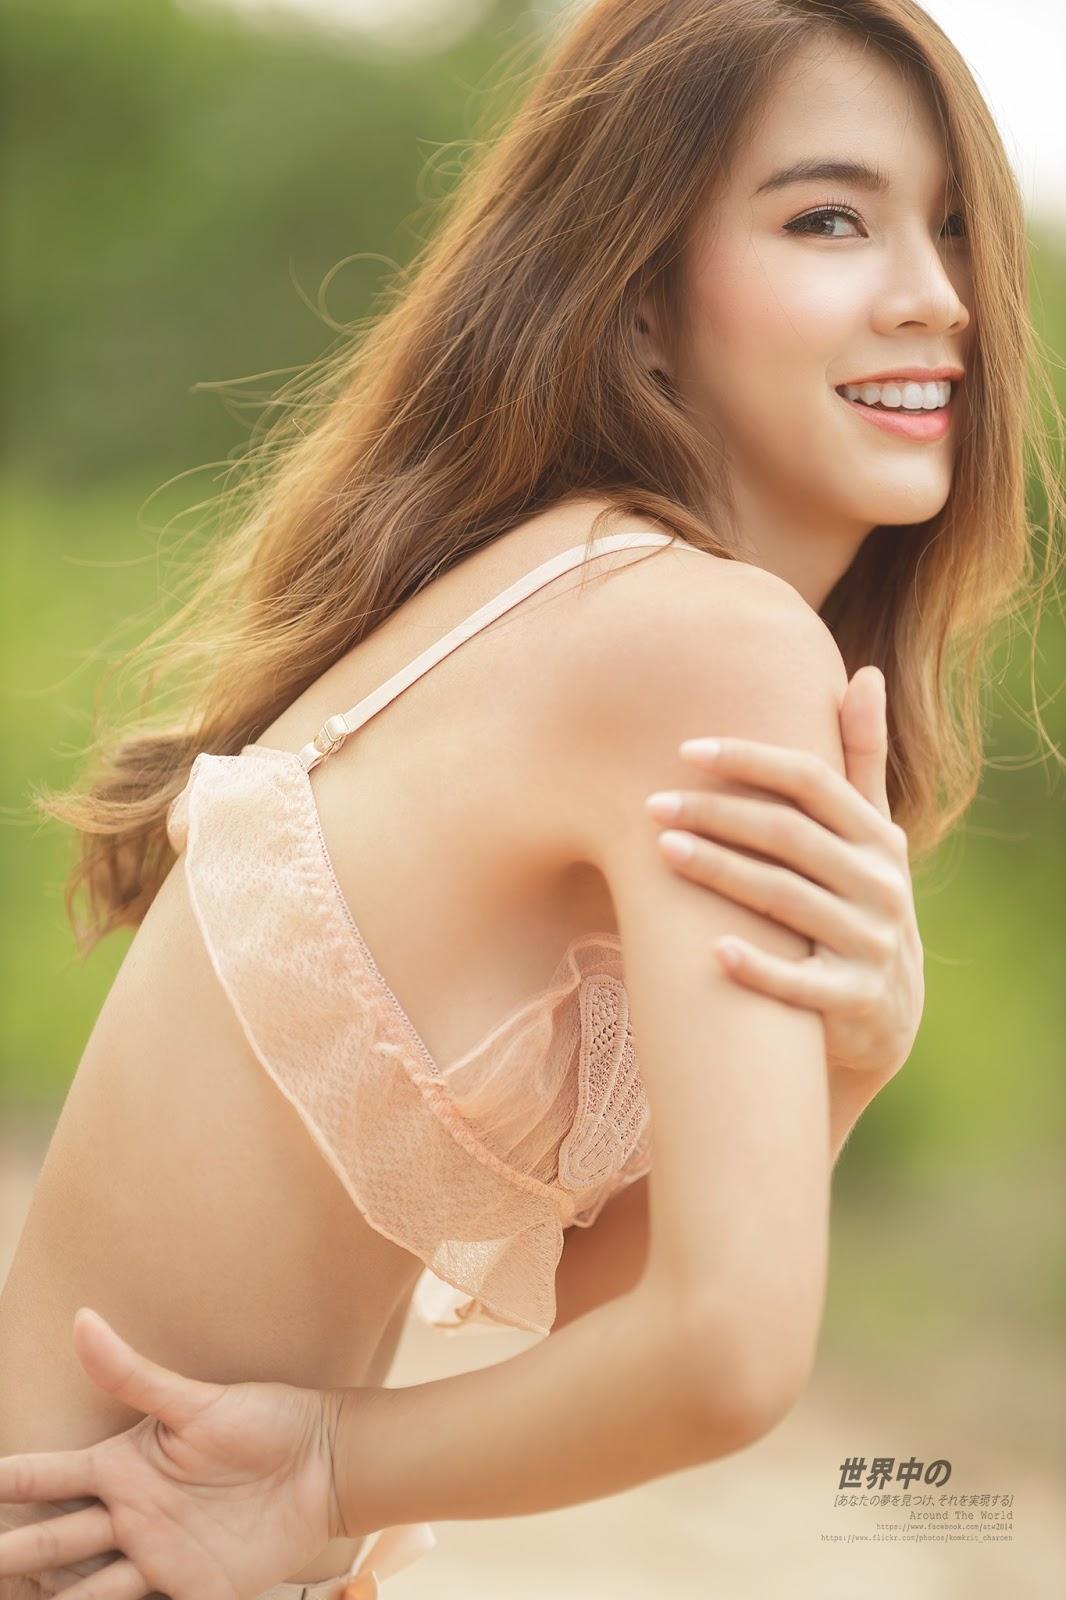 Thailand Beautyful Girl Pic No.243    Maeylin Lin